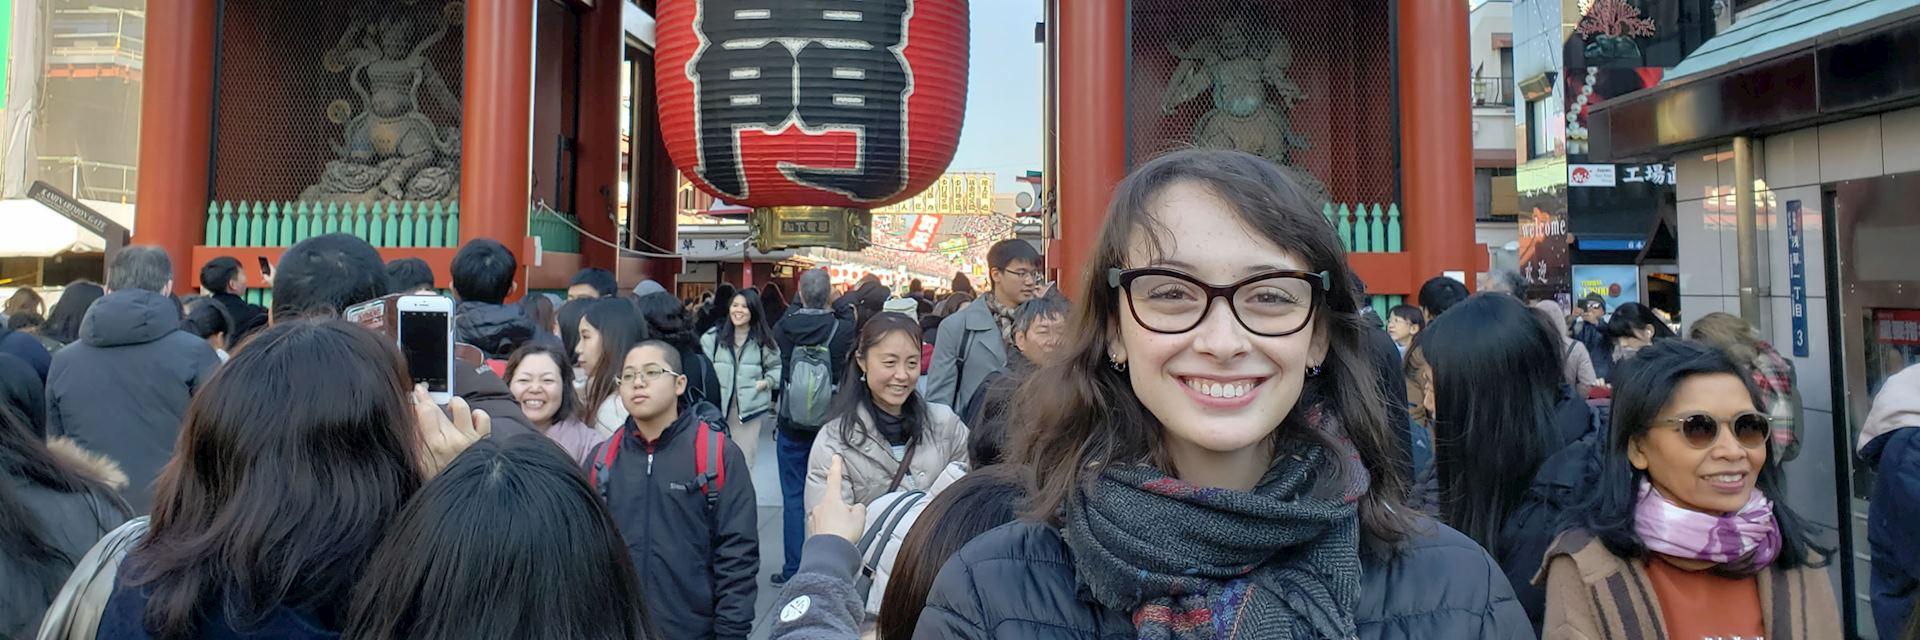 Rachel in Tokyo's Asakusa district